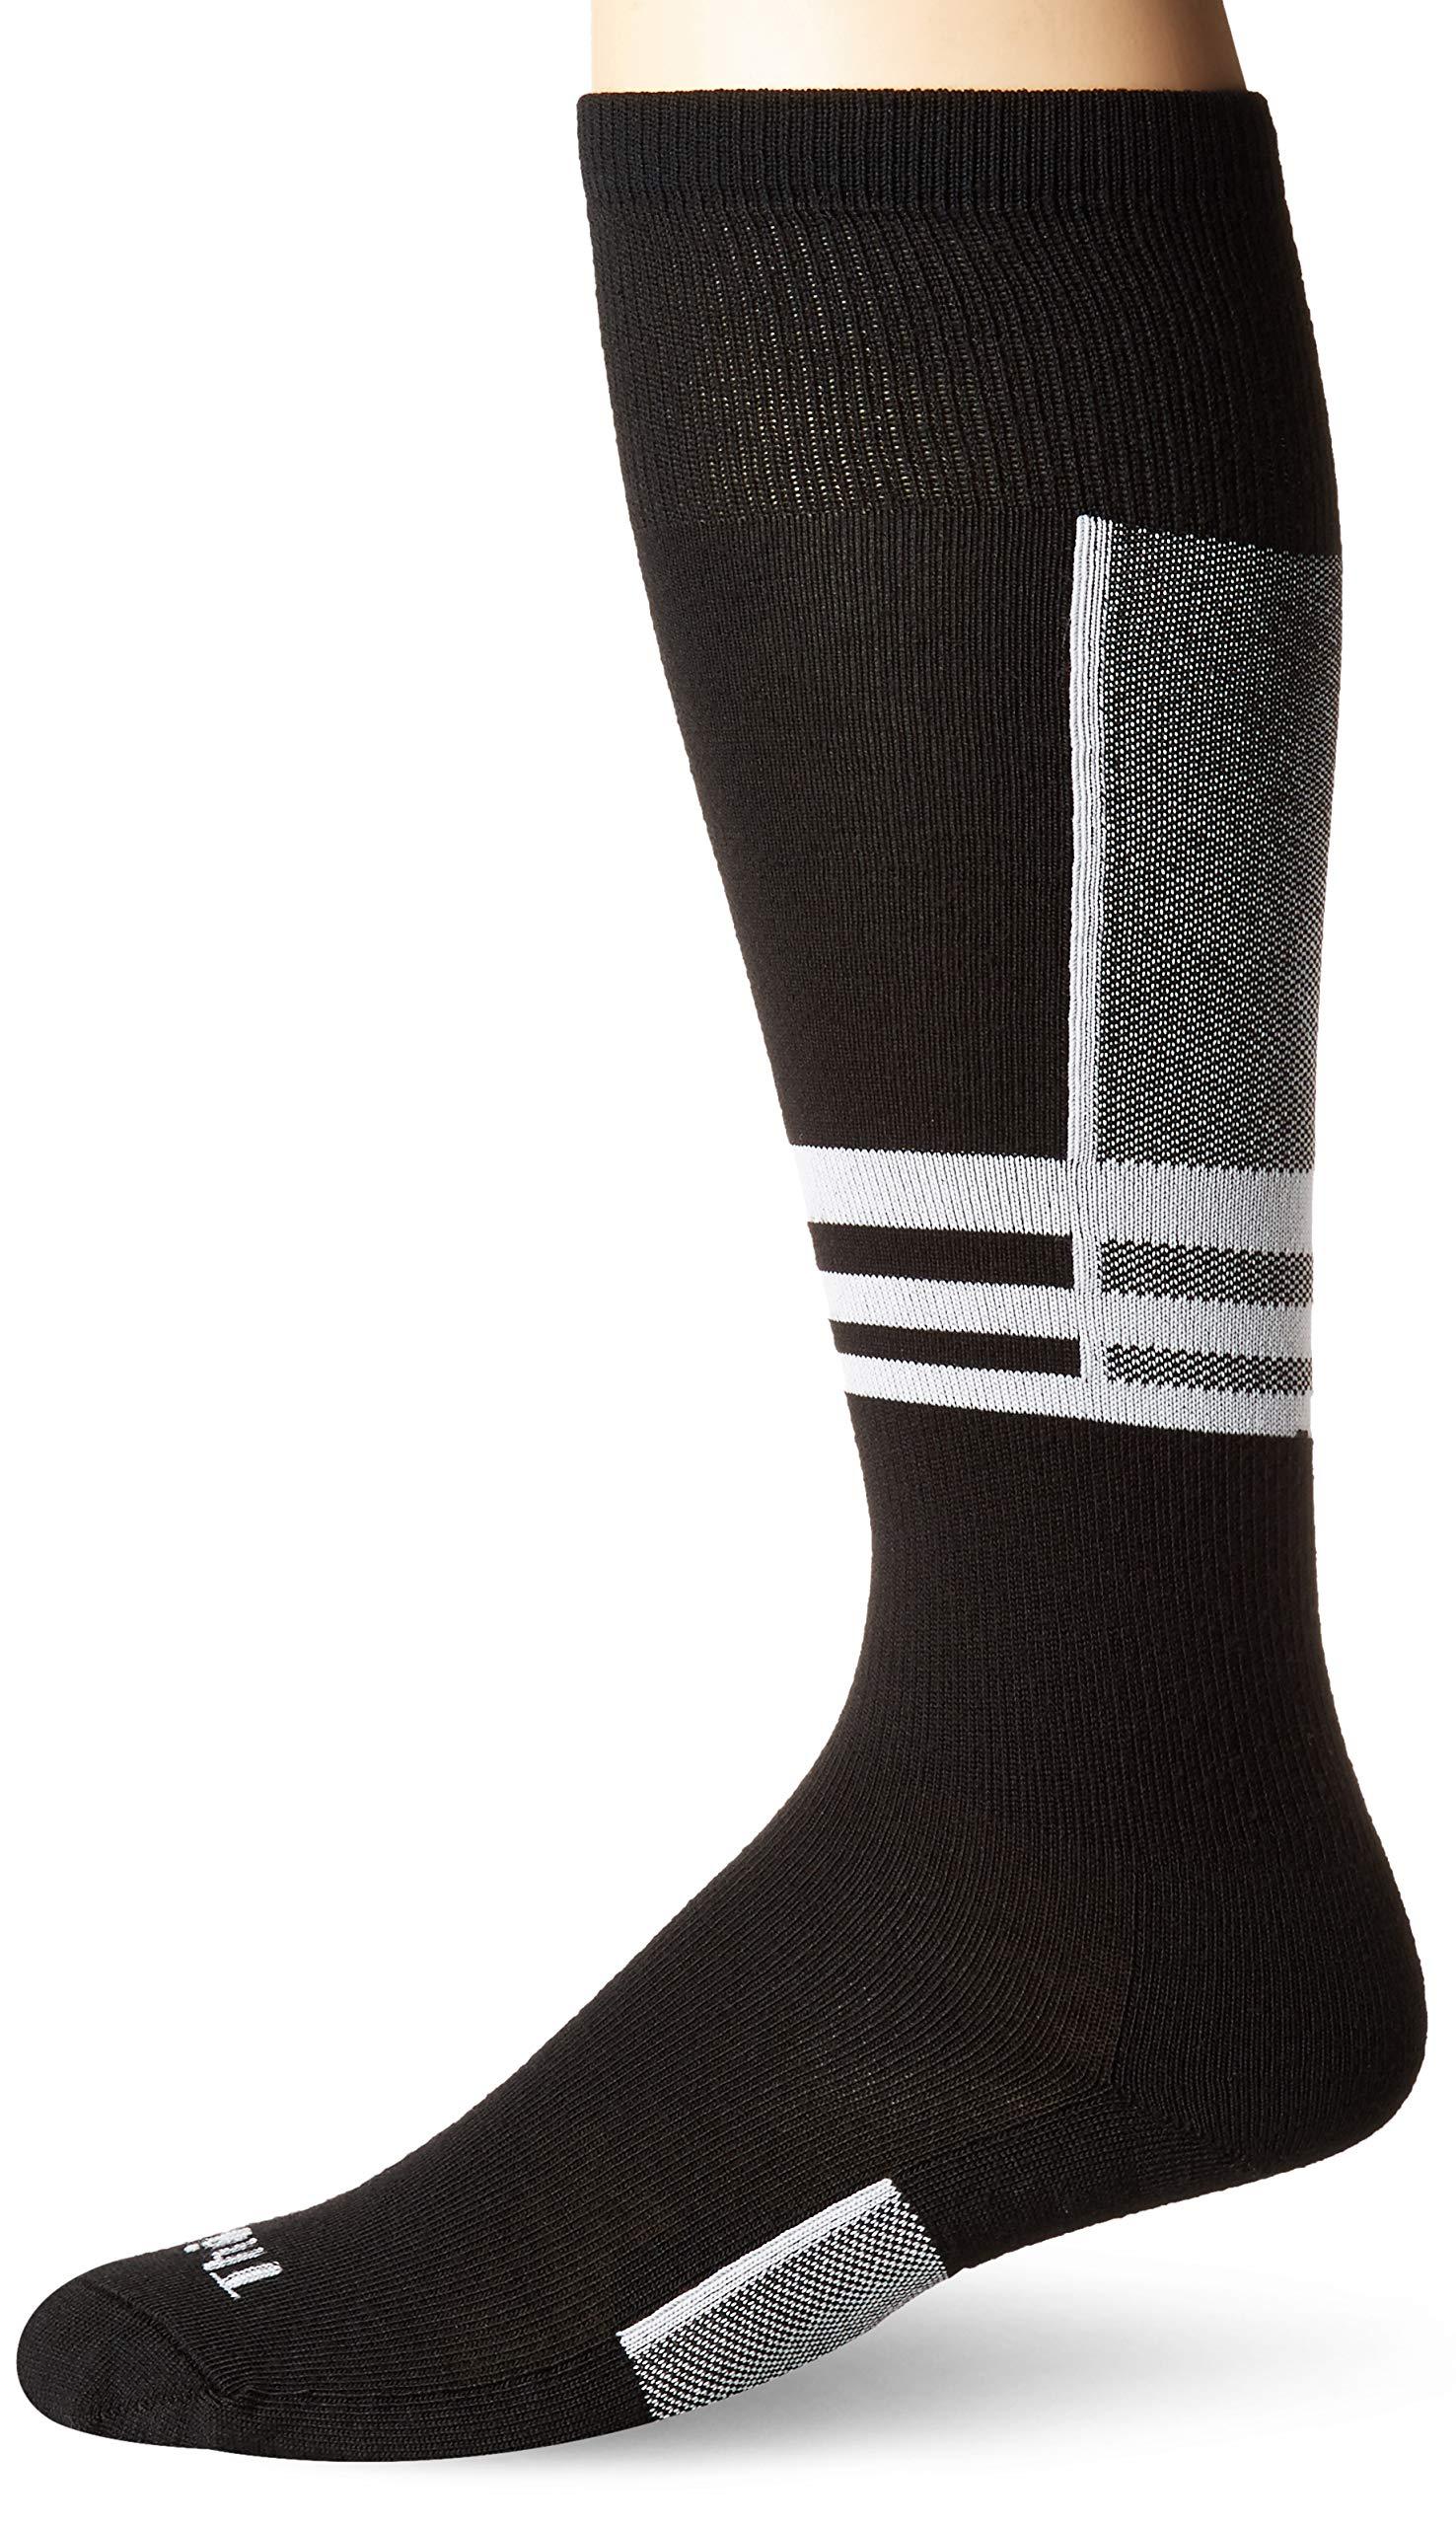 Thorlos Men's Ultra Thin Skiing Over-The-Calf Socks, Powder White, Large by thorlos